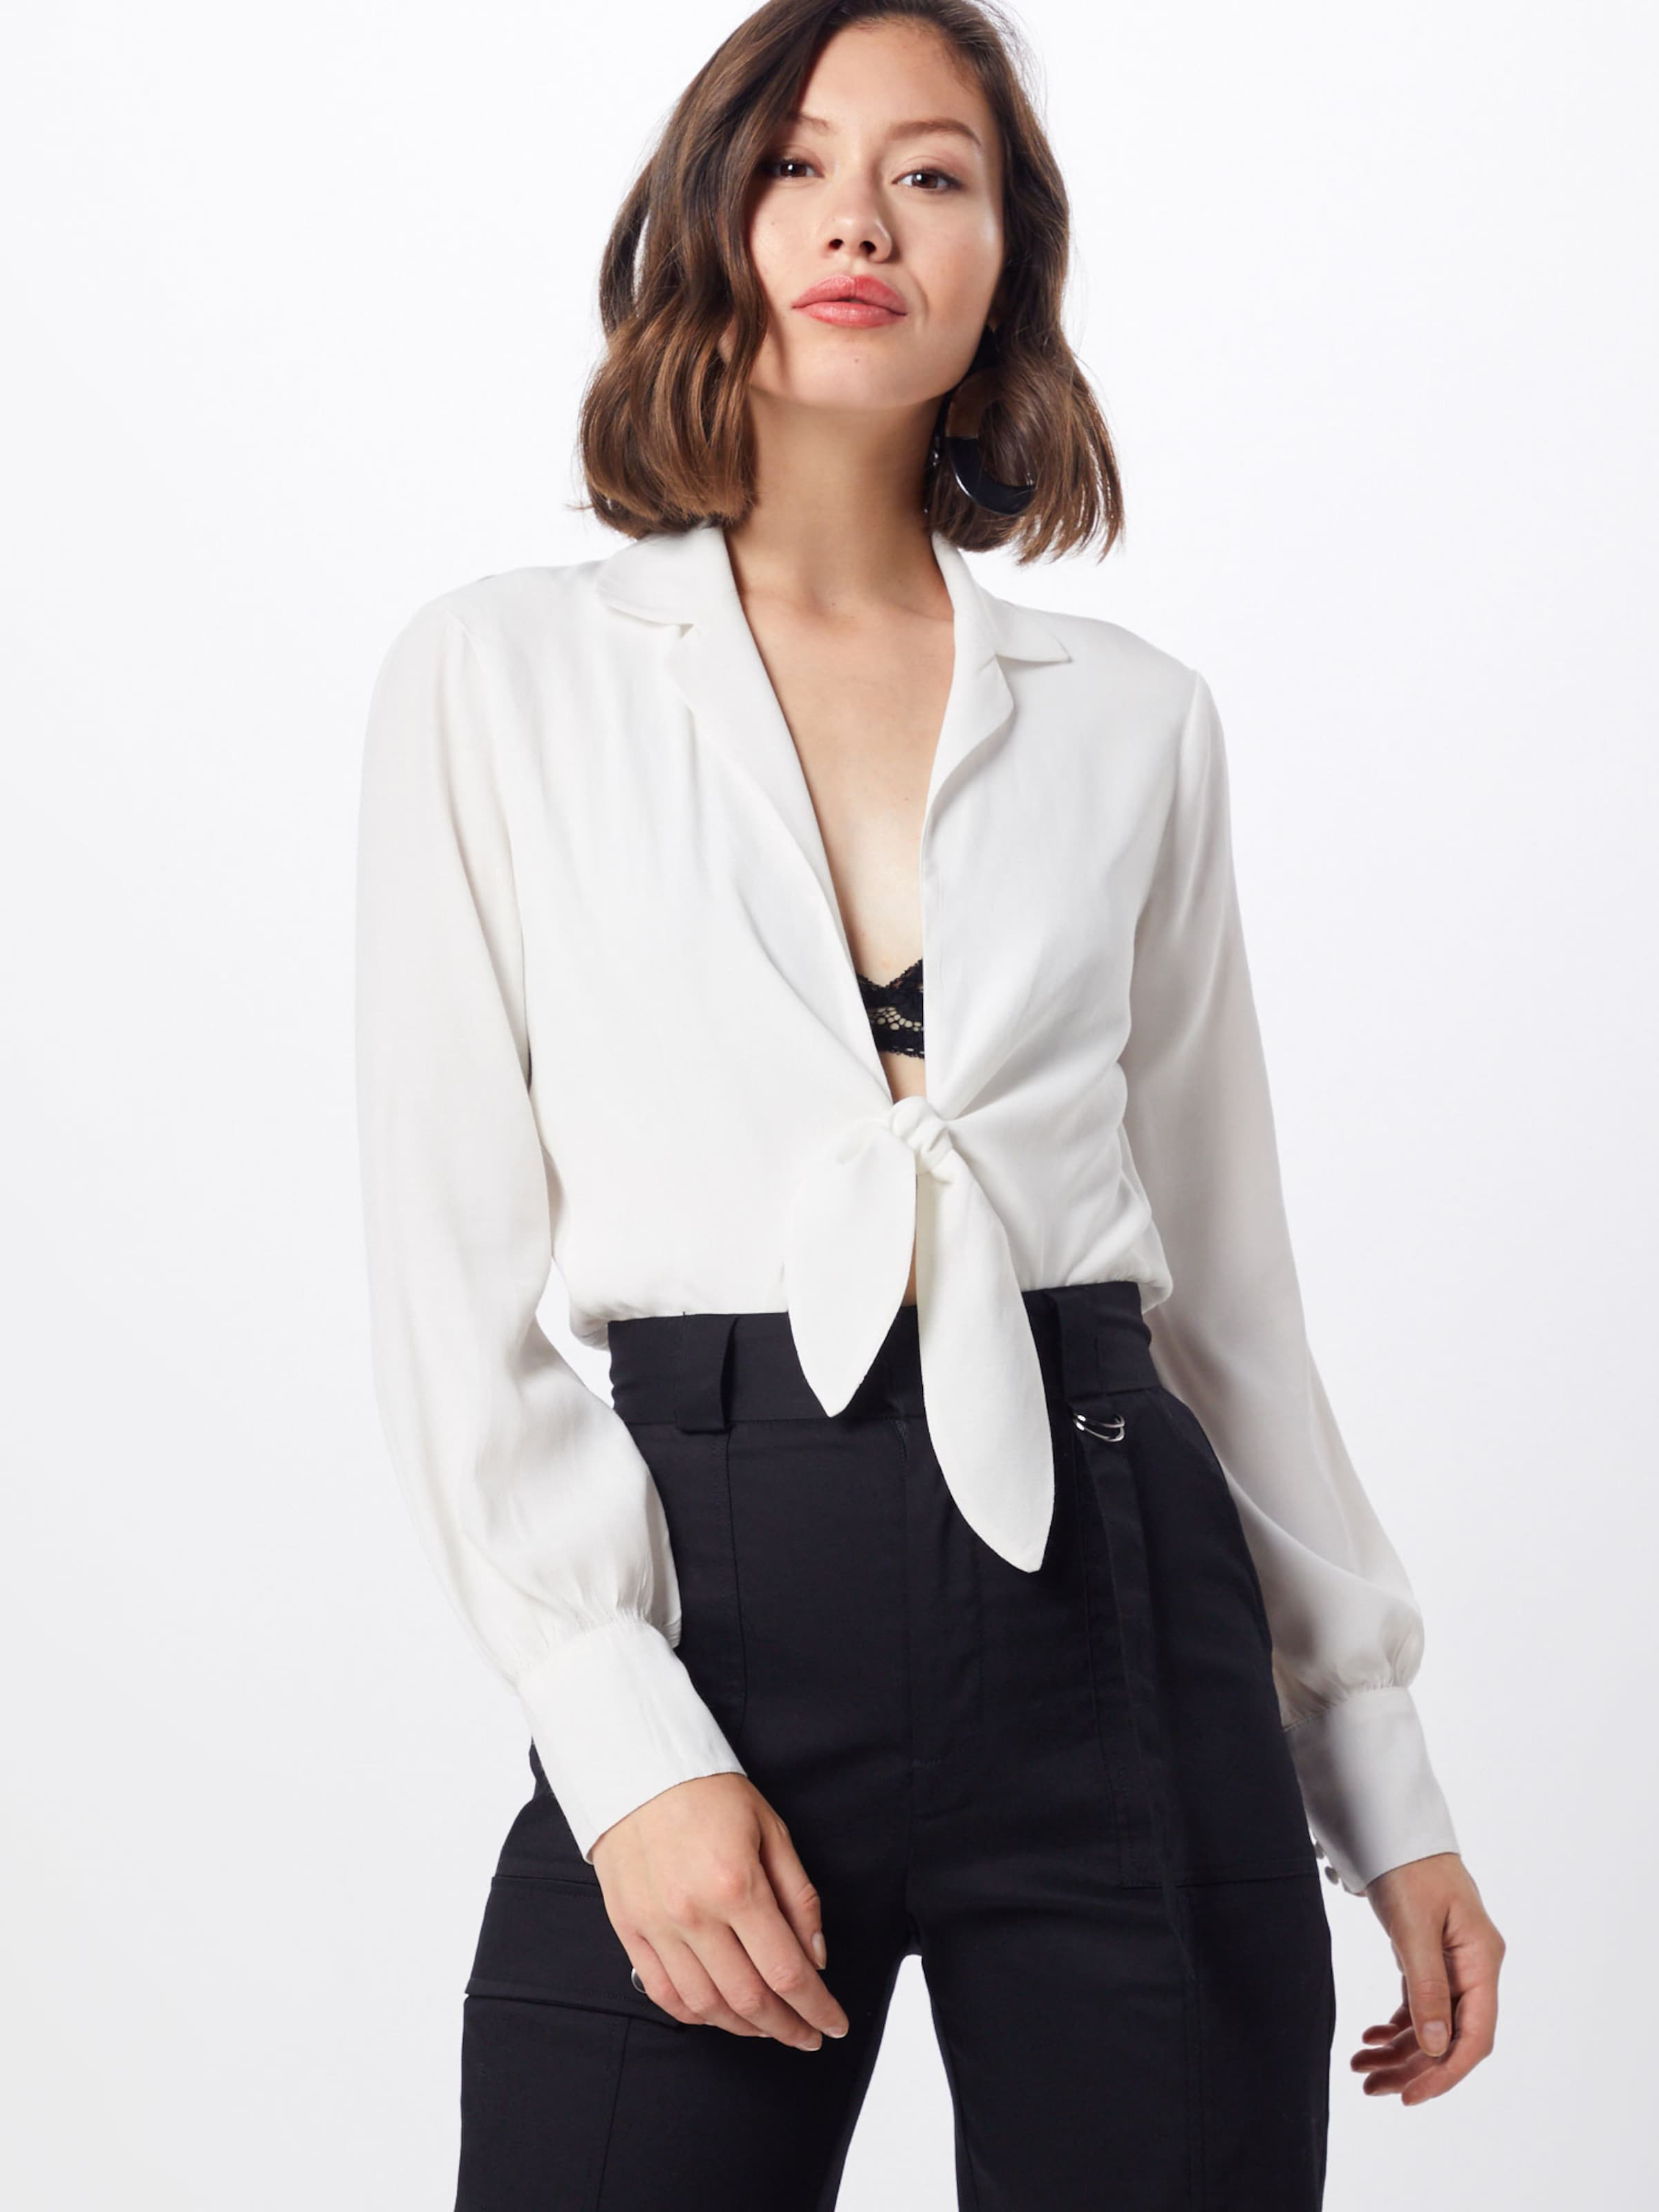 Bardot Weiß DamenShirtsamp; 'shirt In Bodysuit' Tops R5S3jc4LAq